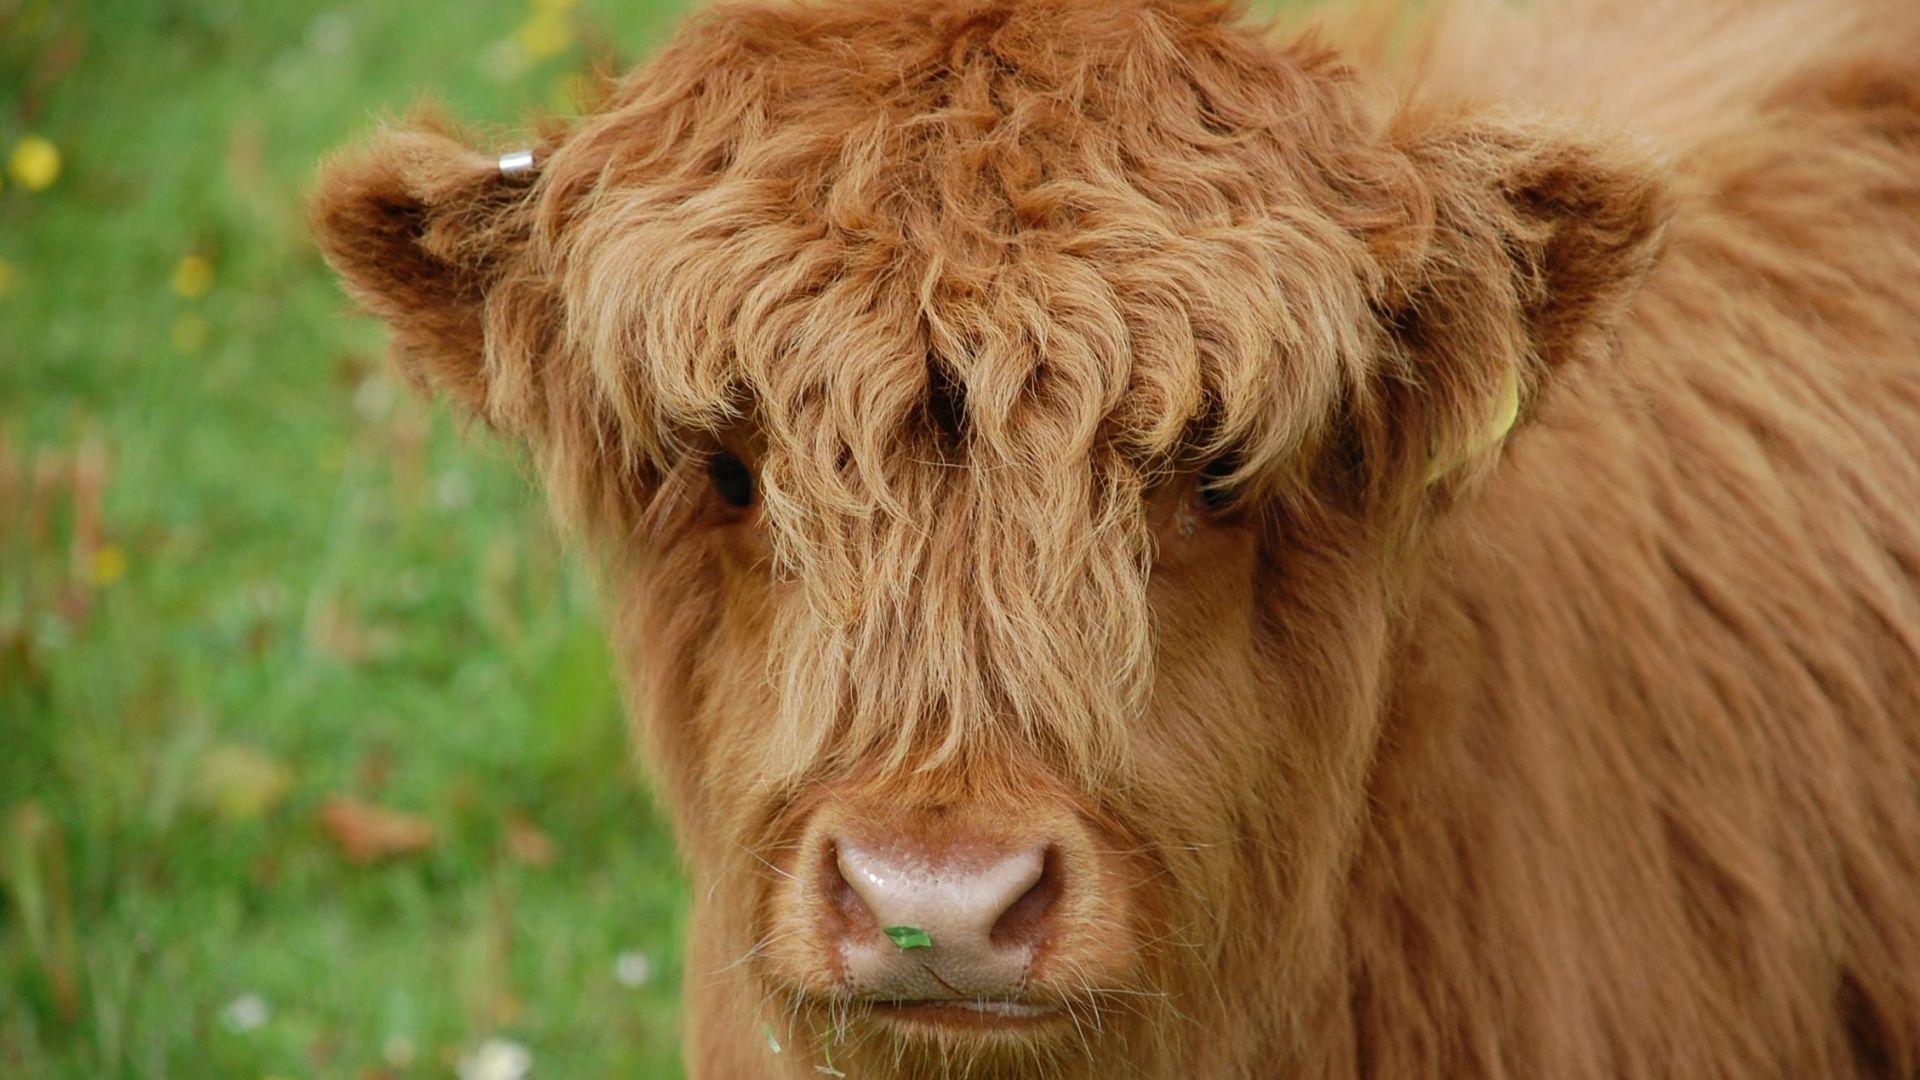 Wallpaper Cow, calf, cattle, domestic animal